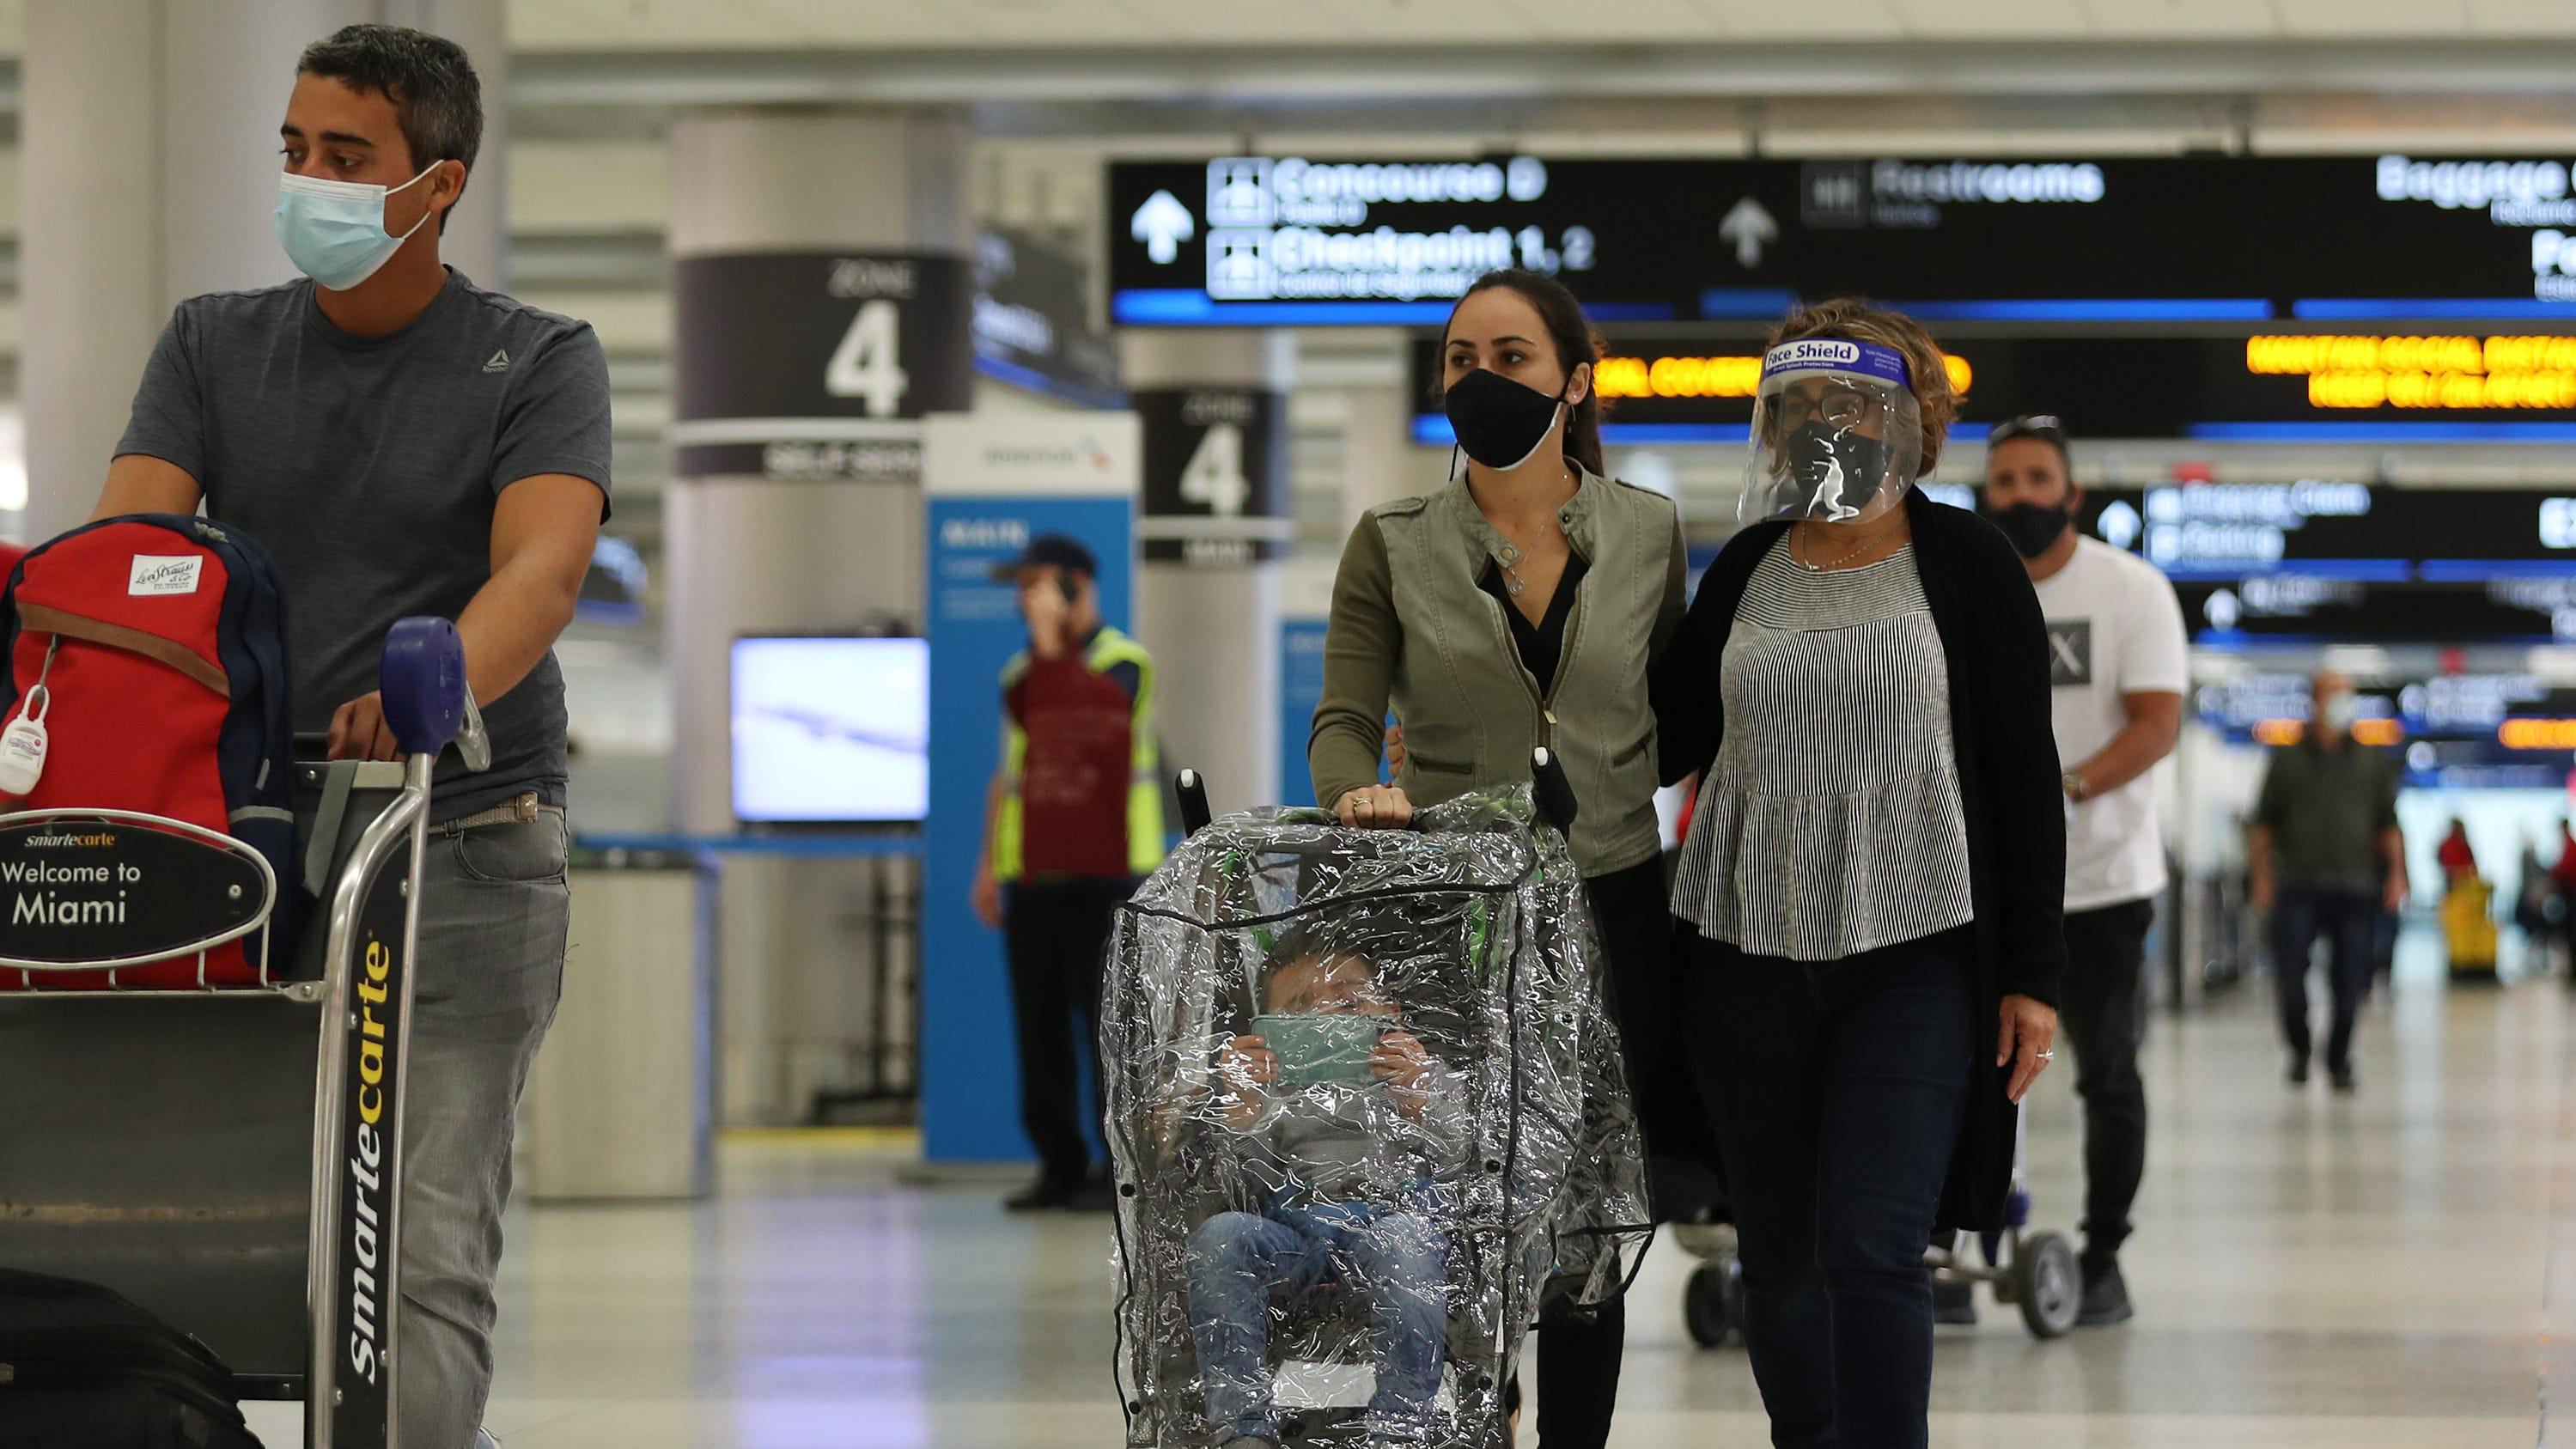 CDC建议下调旅行限制等级,鼓励旅客出行前接种疫苗